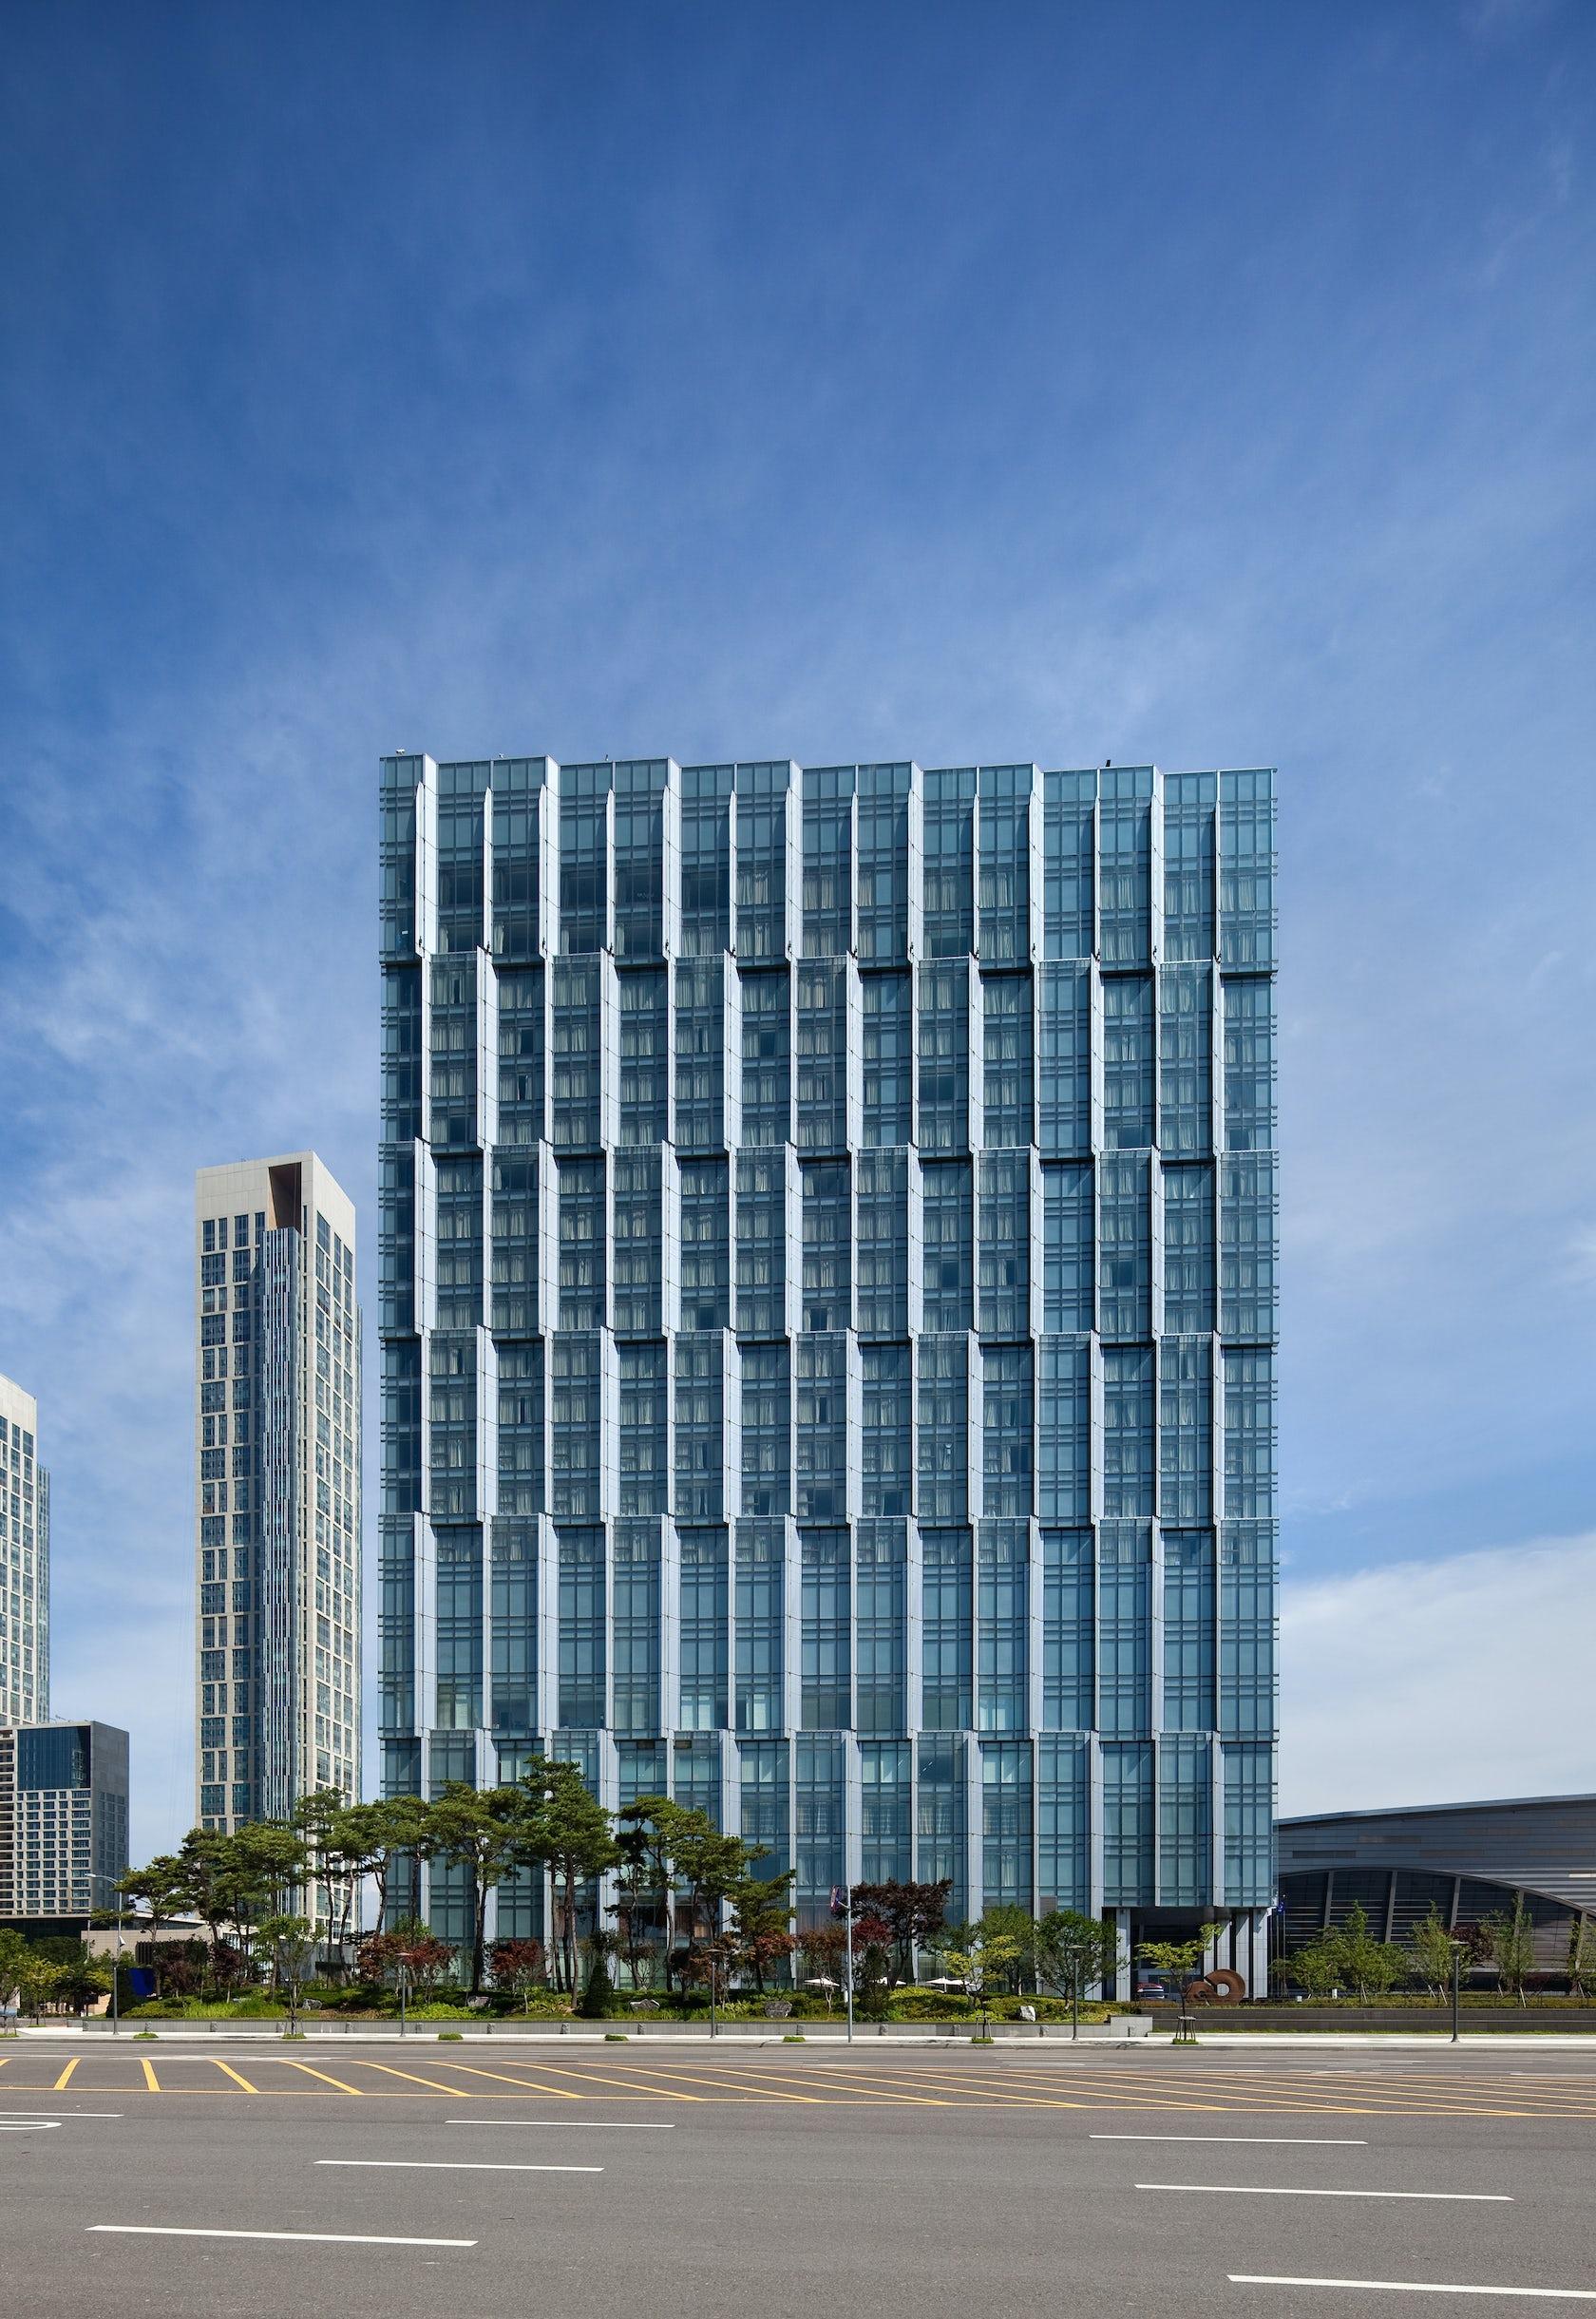 Capital City Auto >> Sheraton Incheon Hotel - Architizer